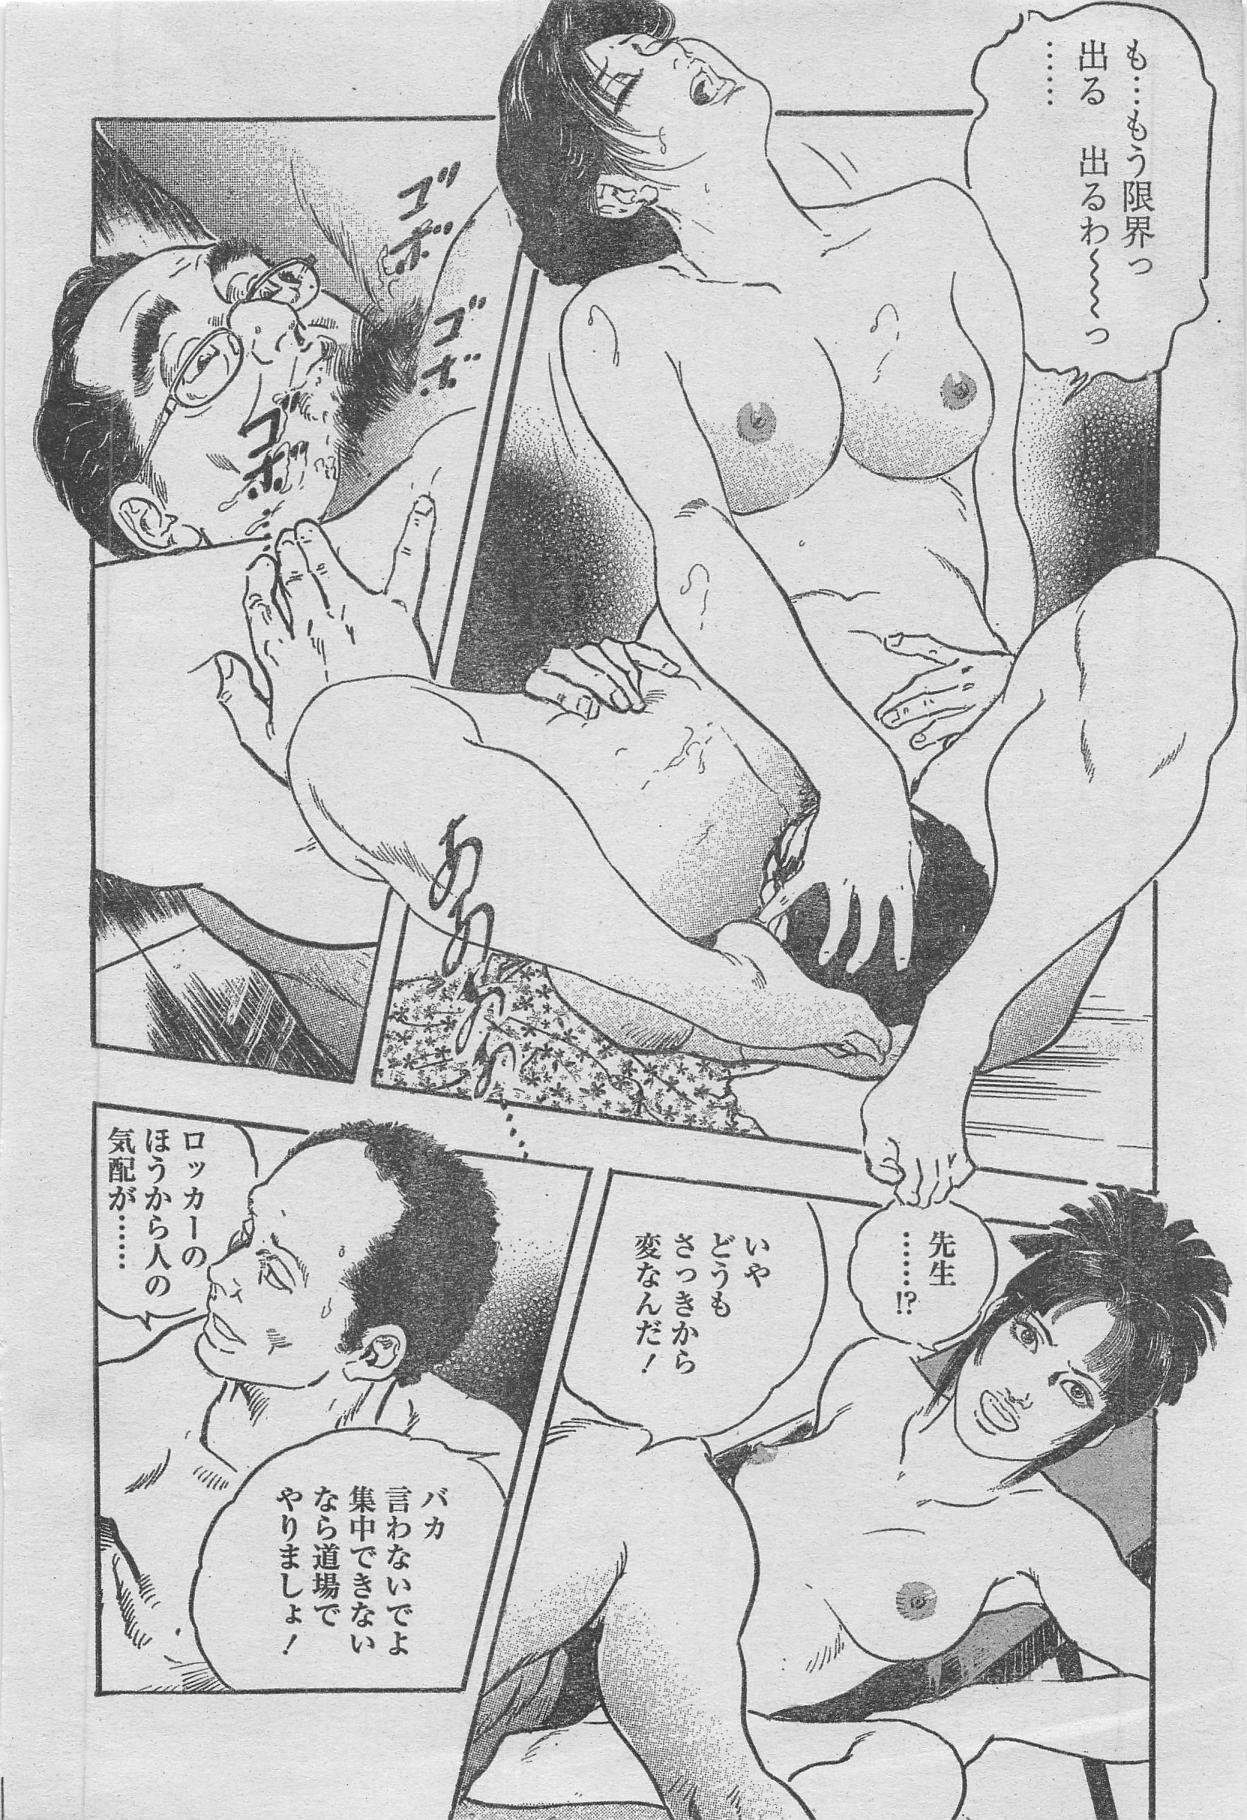 Manga Lawrence 2013-04 159